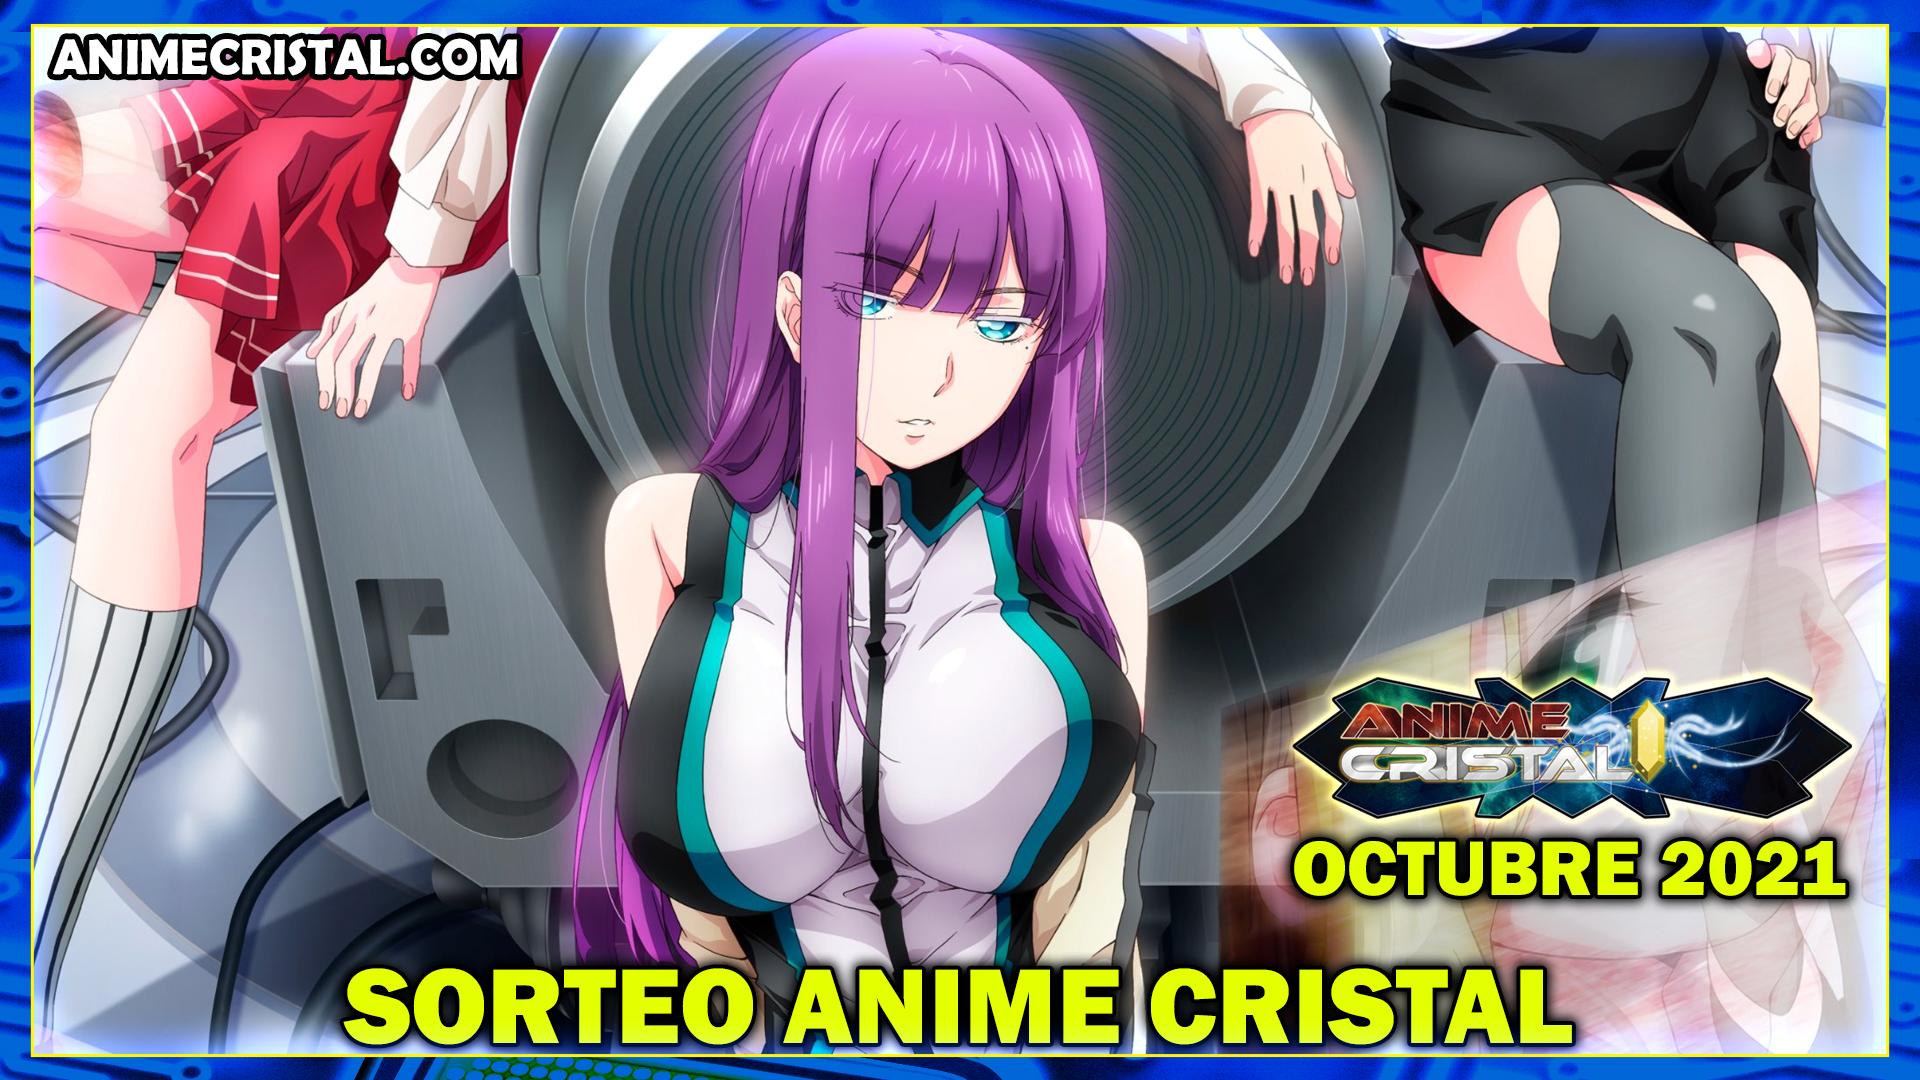 Sorteo Anime Cristal Octubre 2021